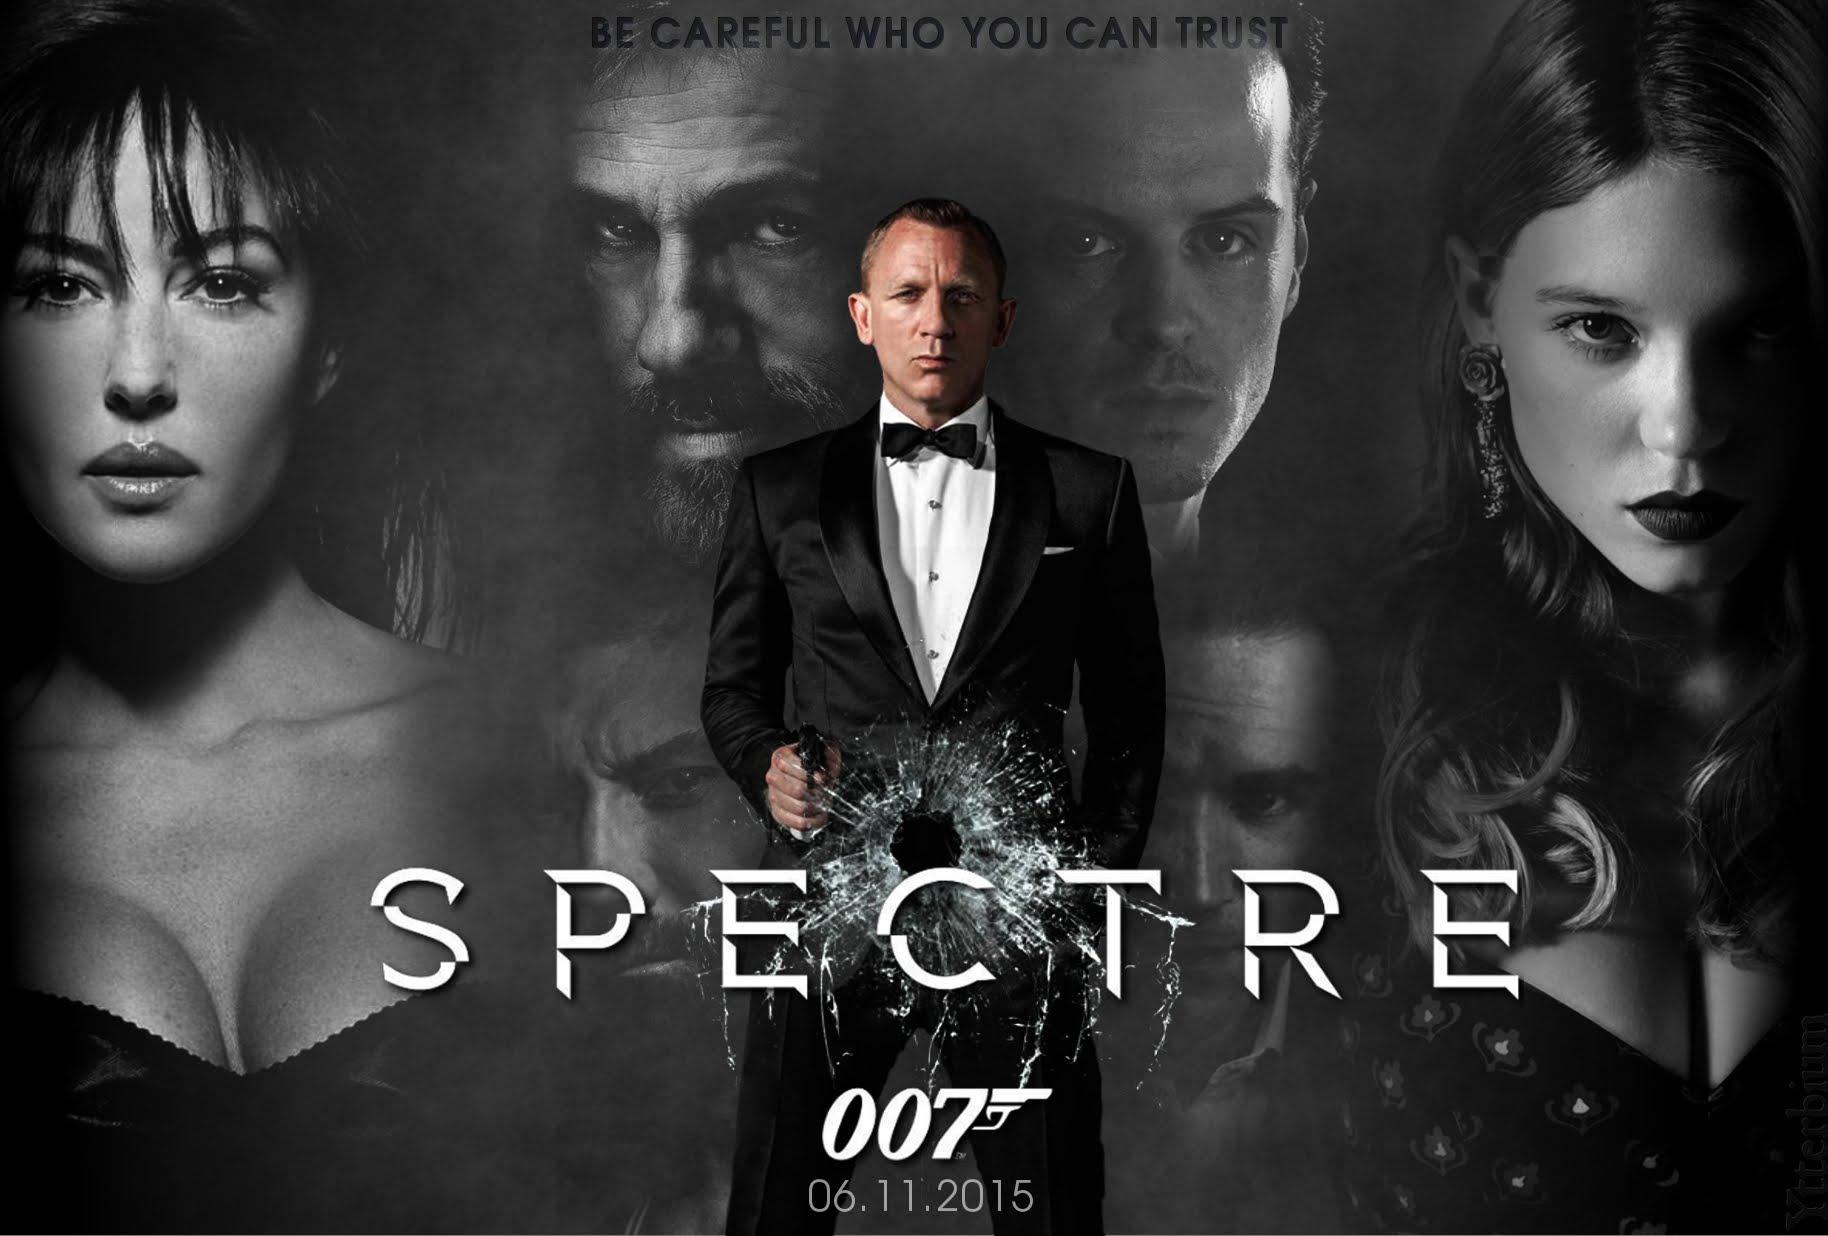 Spectre (2015) image